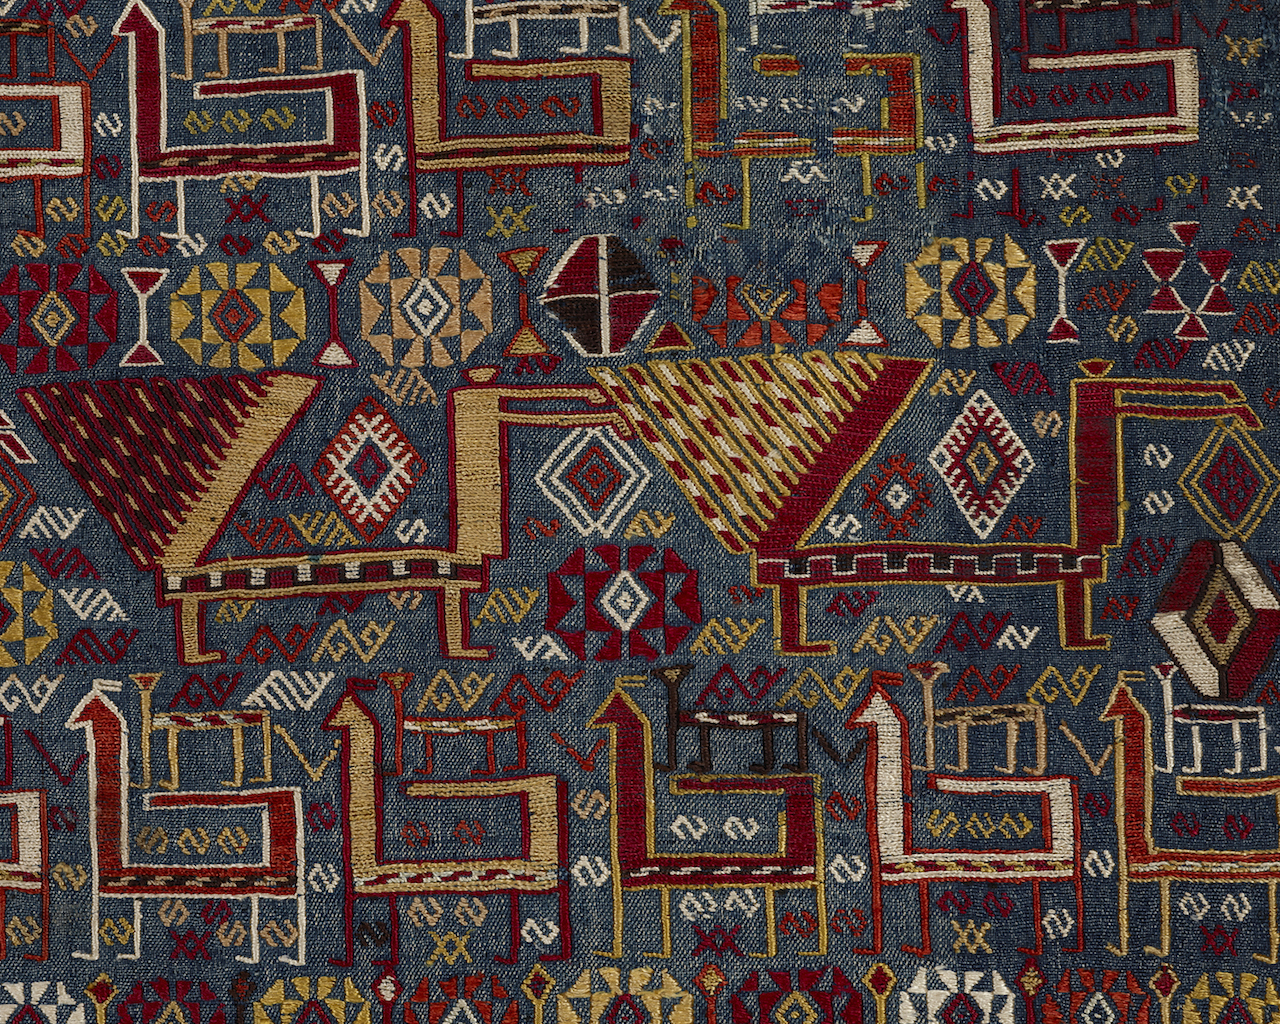 Detail of horse cover, Northwestern Iran or Caucasus, Shahsevan people, 1850–1900, 60 x 48 in (gift of Arthur D. Jenkins)